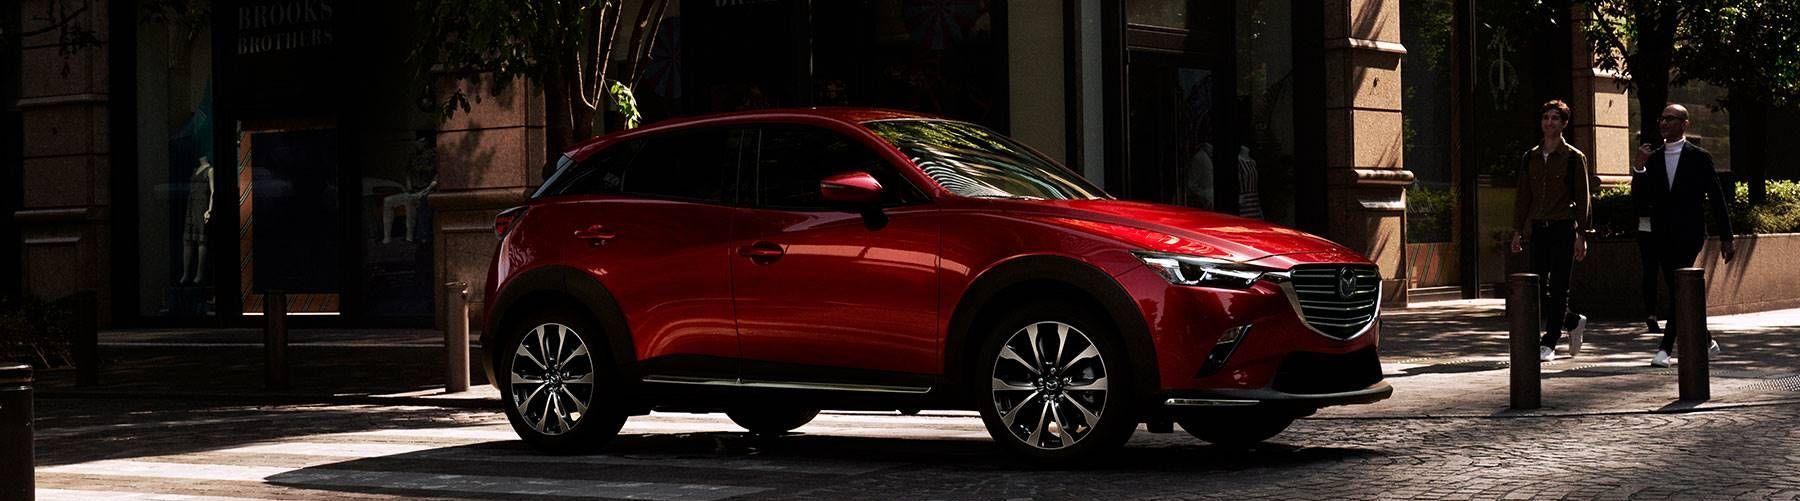 2019 Mazda CX-3 for Sale near Austin, TX